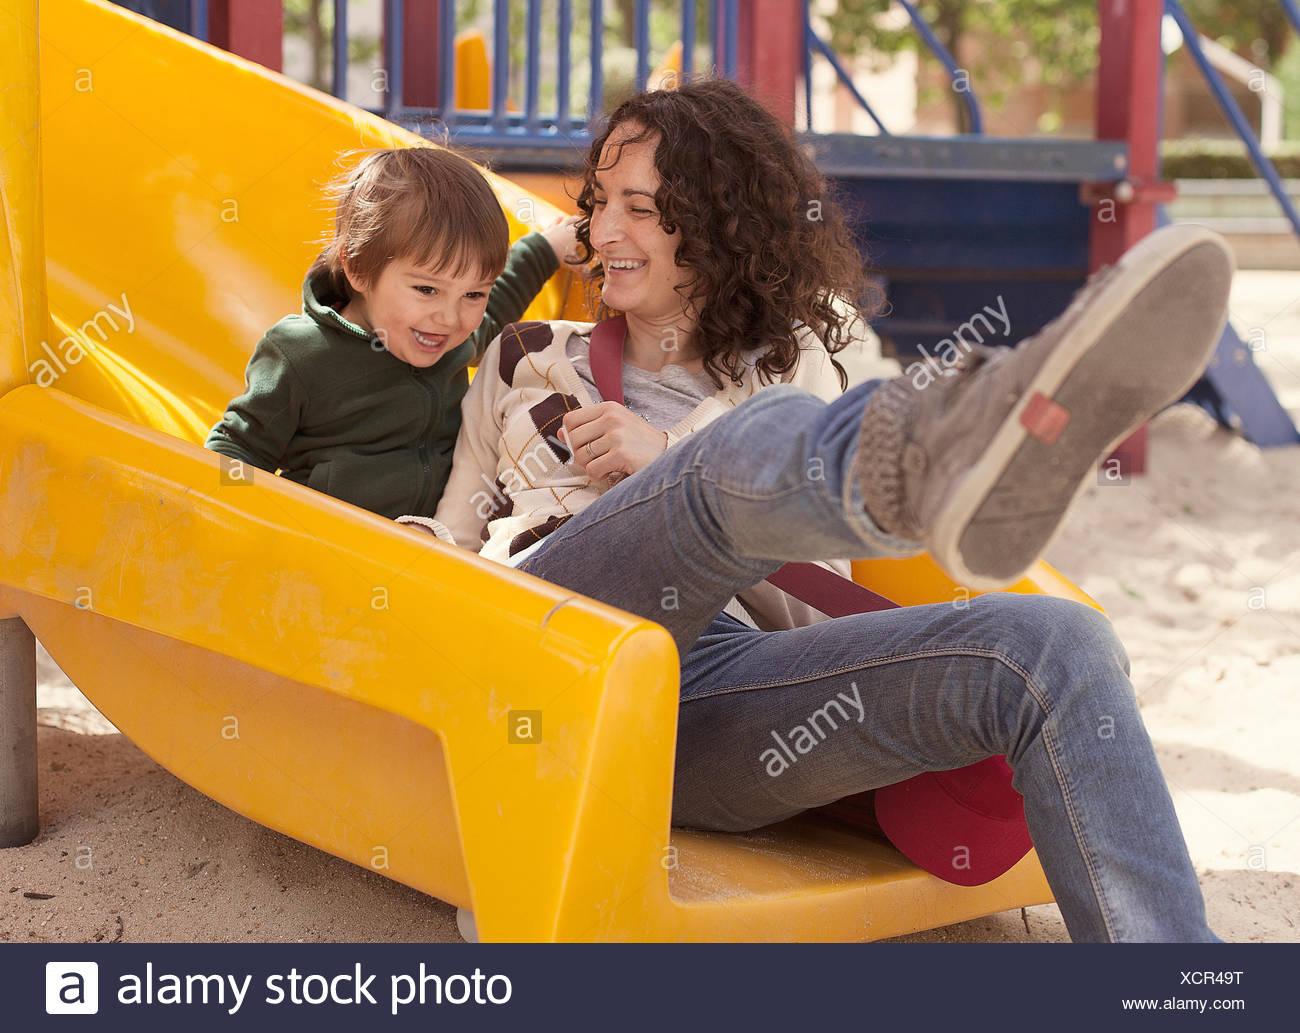 Madre e hijo en una diapositiva de playground Imagen De Stock